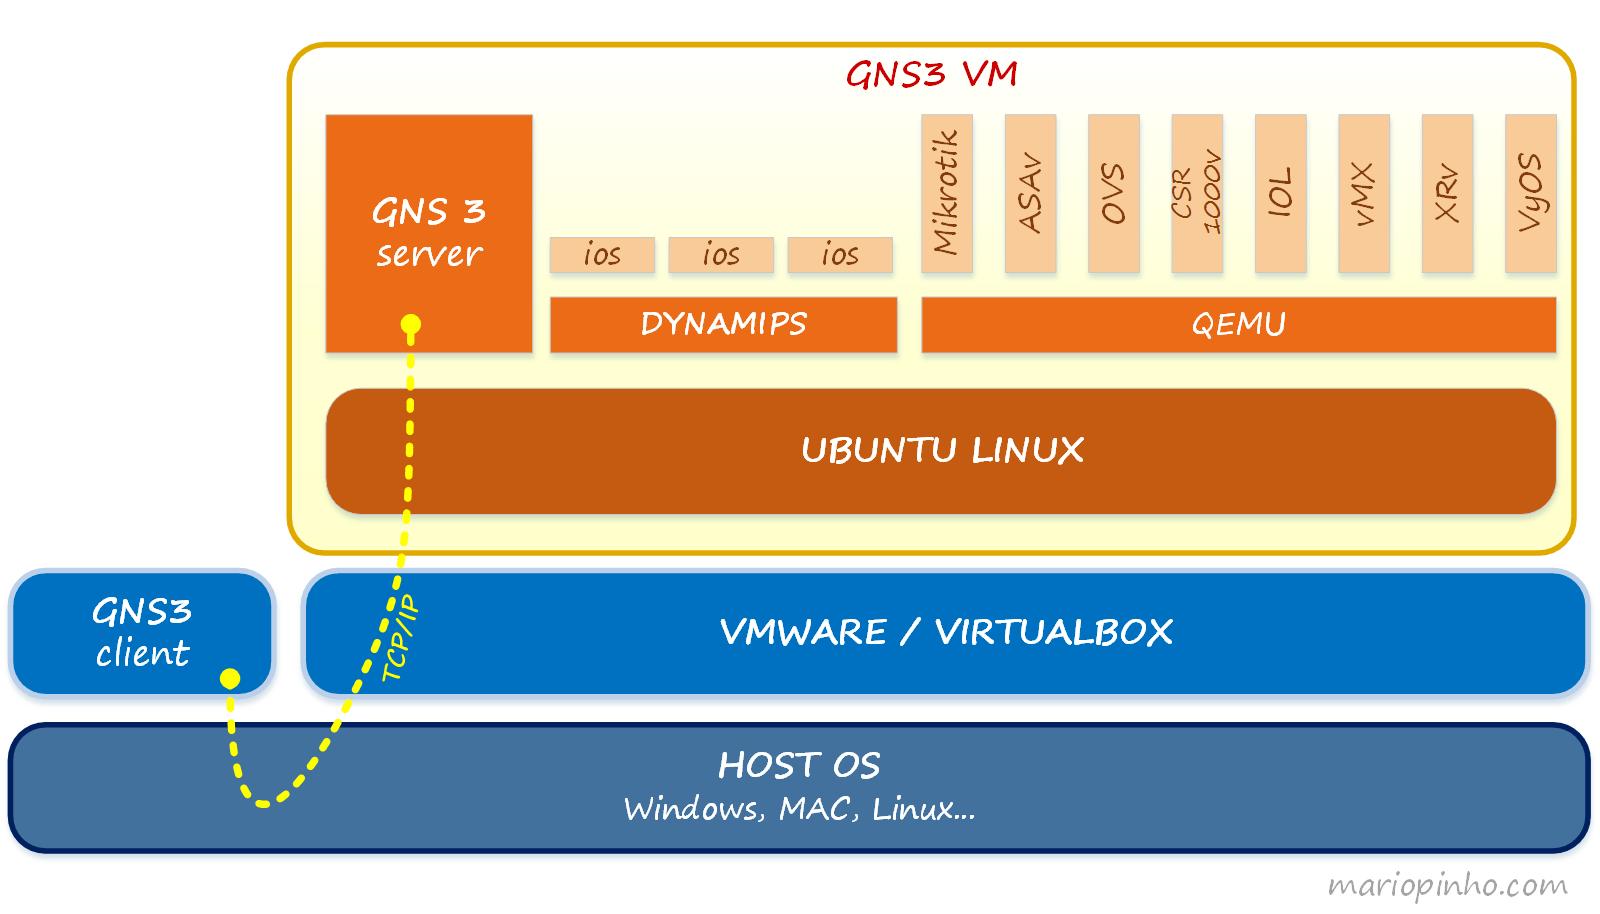 GNS3 VM